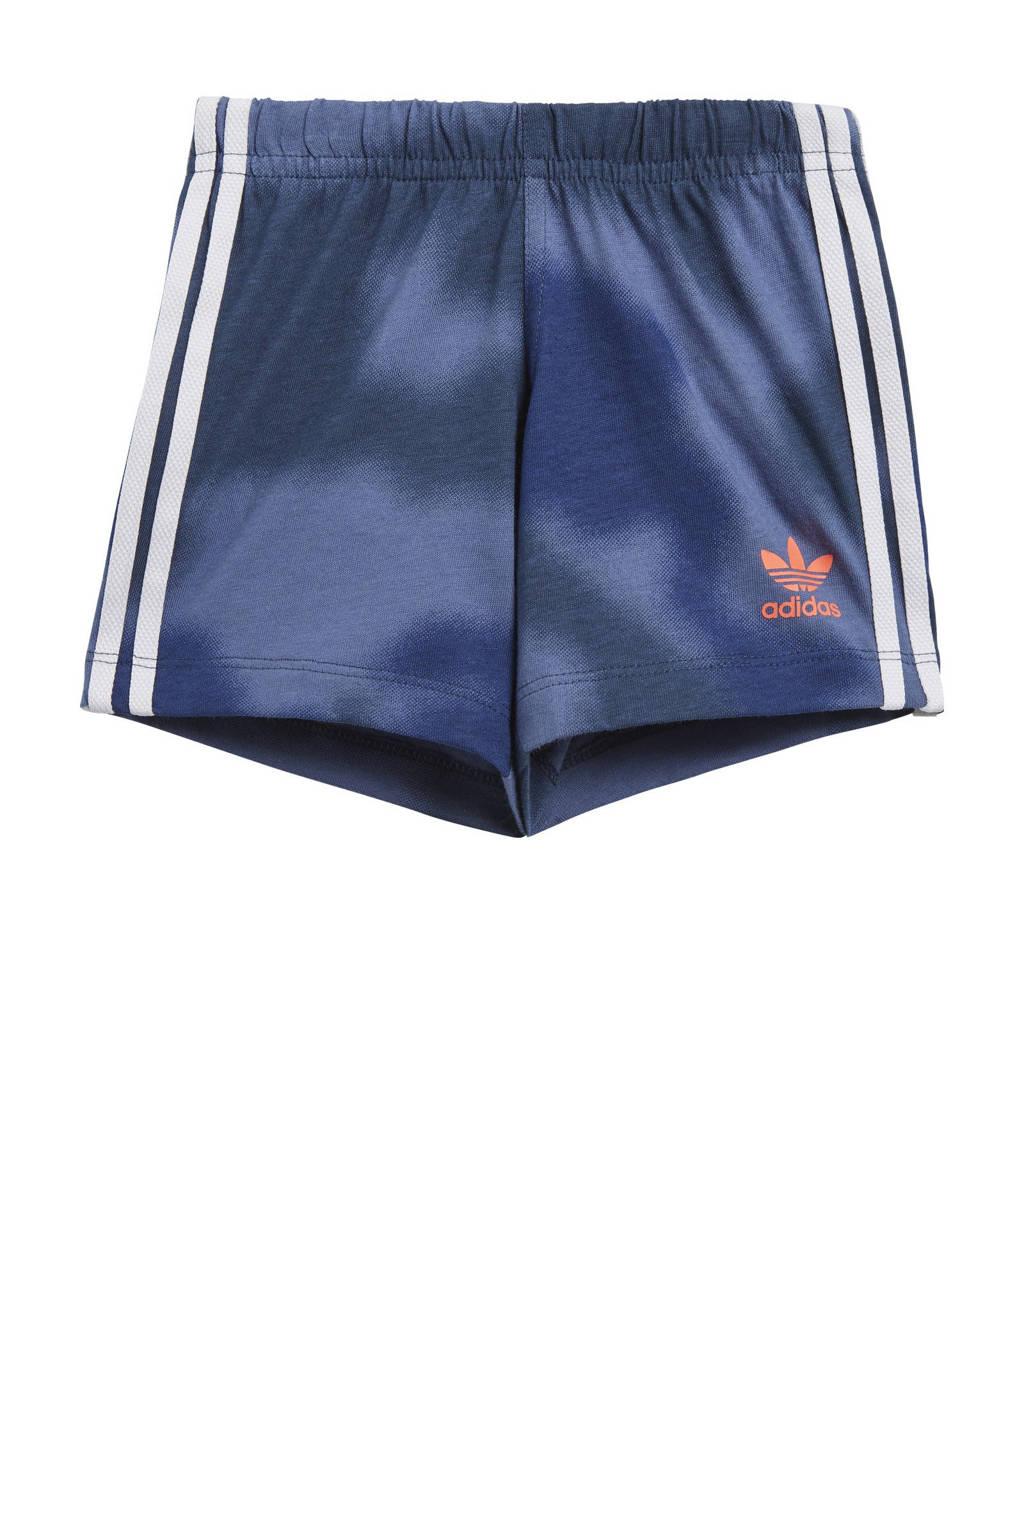 adidas Originals   T-shirt + short wit/blauw/oranje, Wit/blauw/oranje